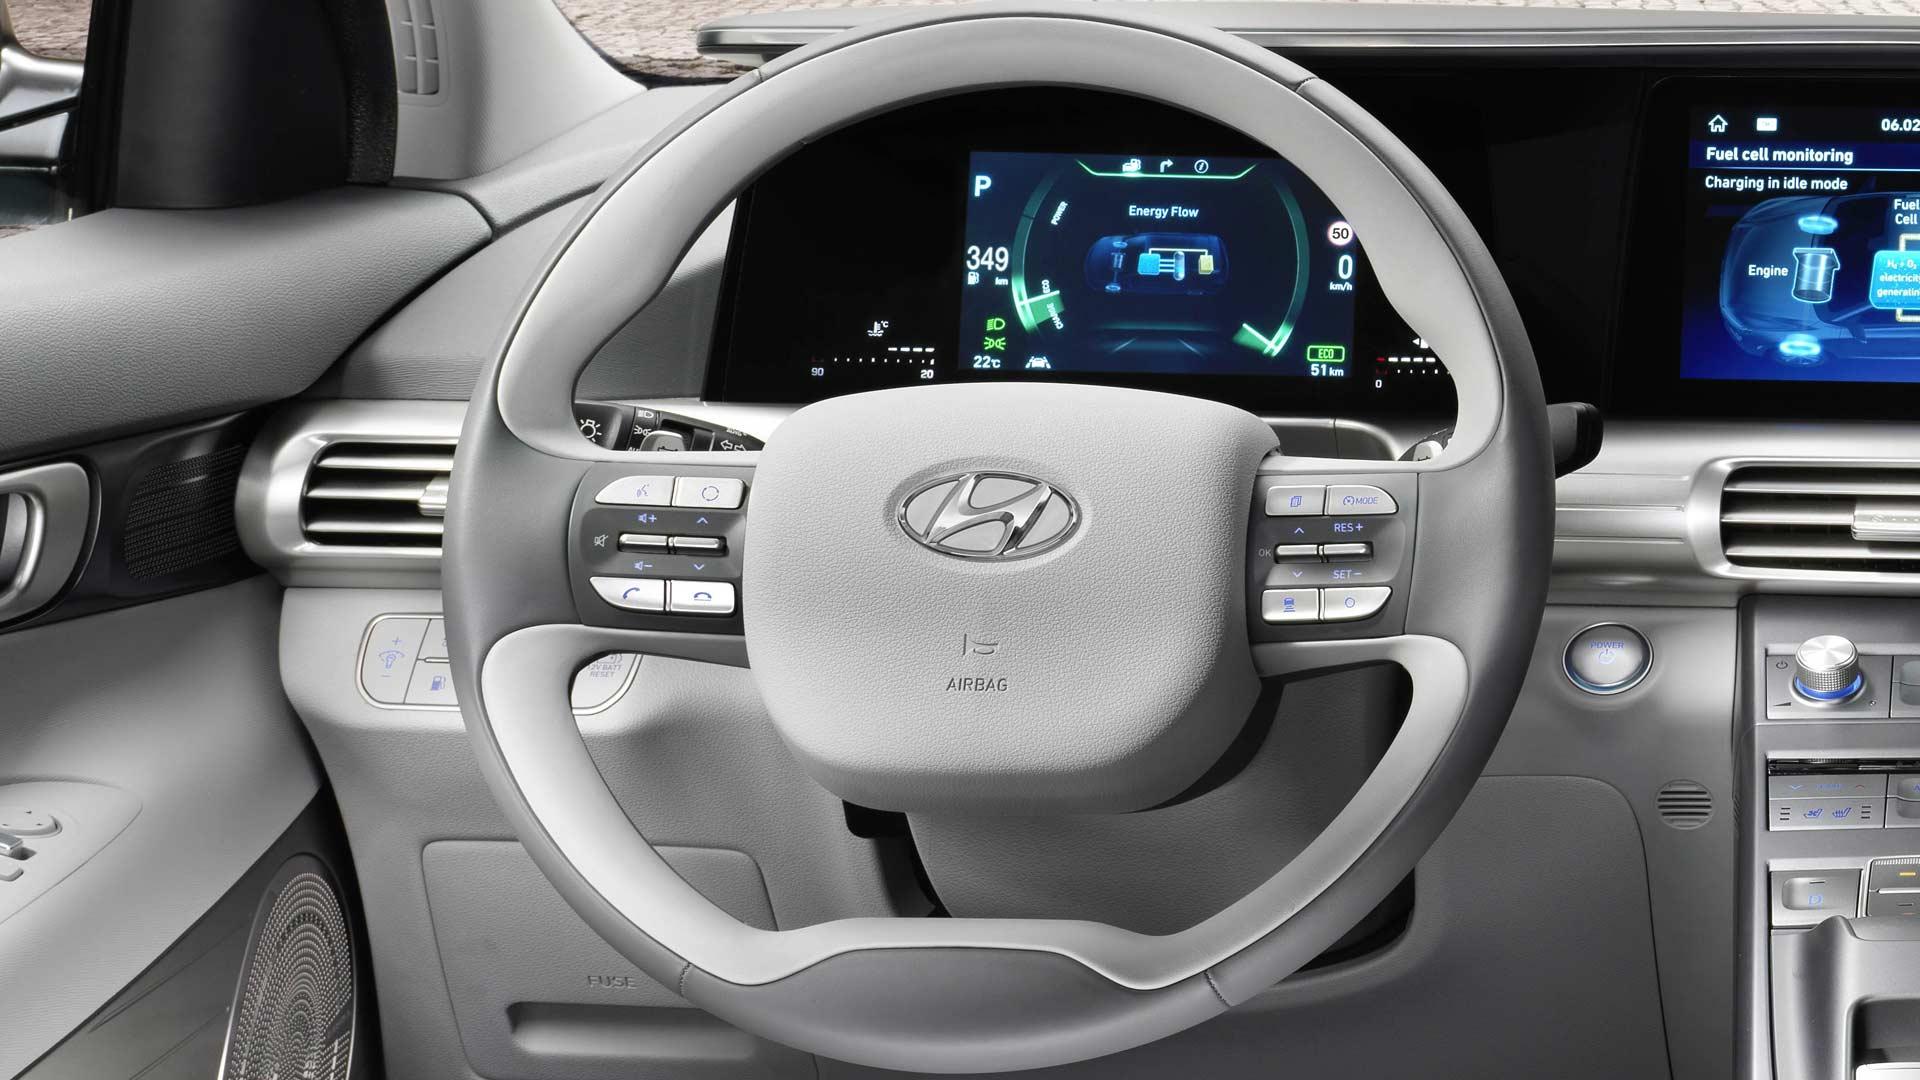 2019-Hyundai-Nexo-fuel-cell-SUV-Interiors_5